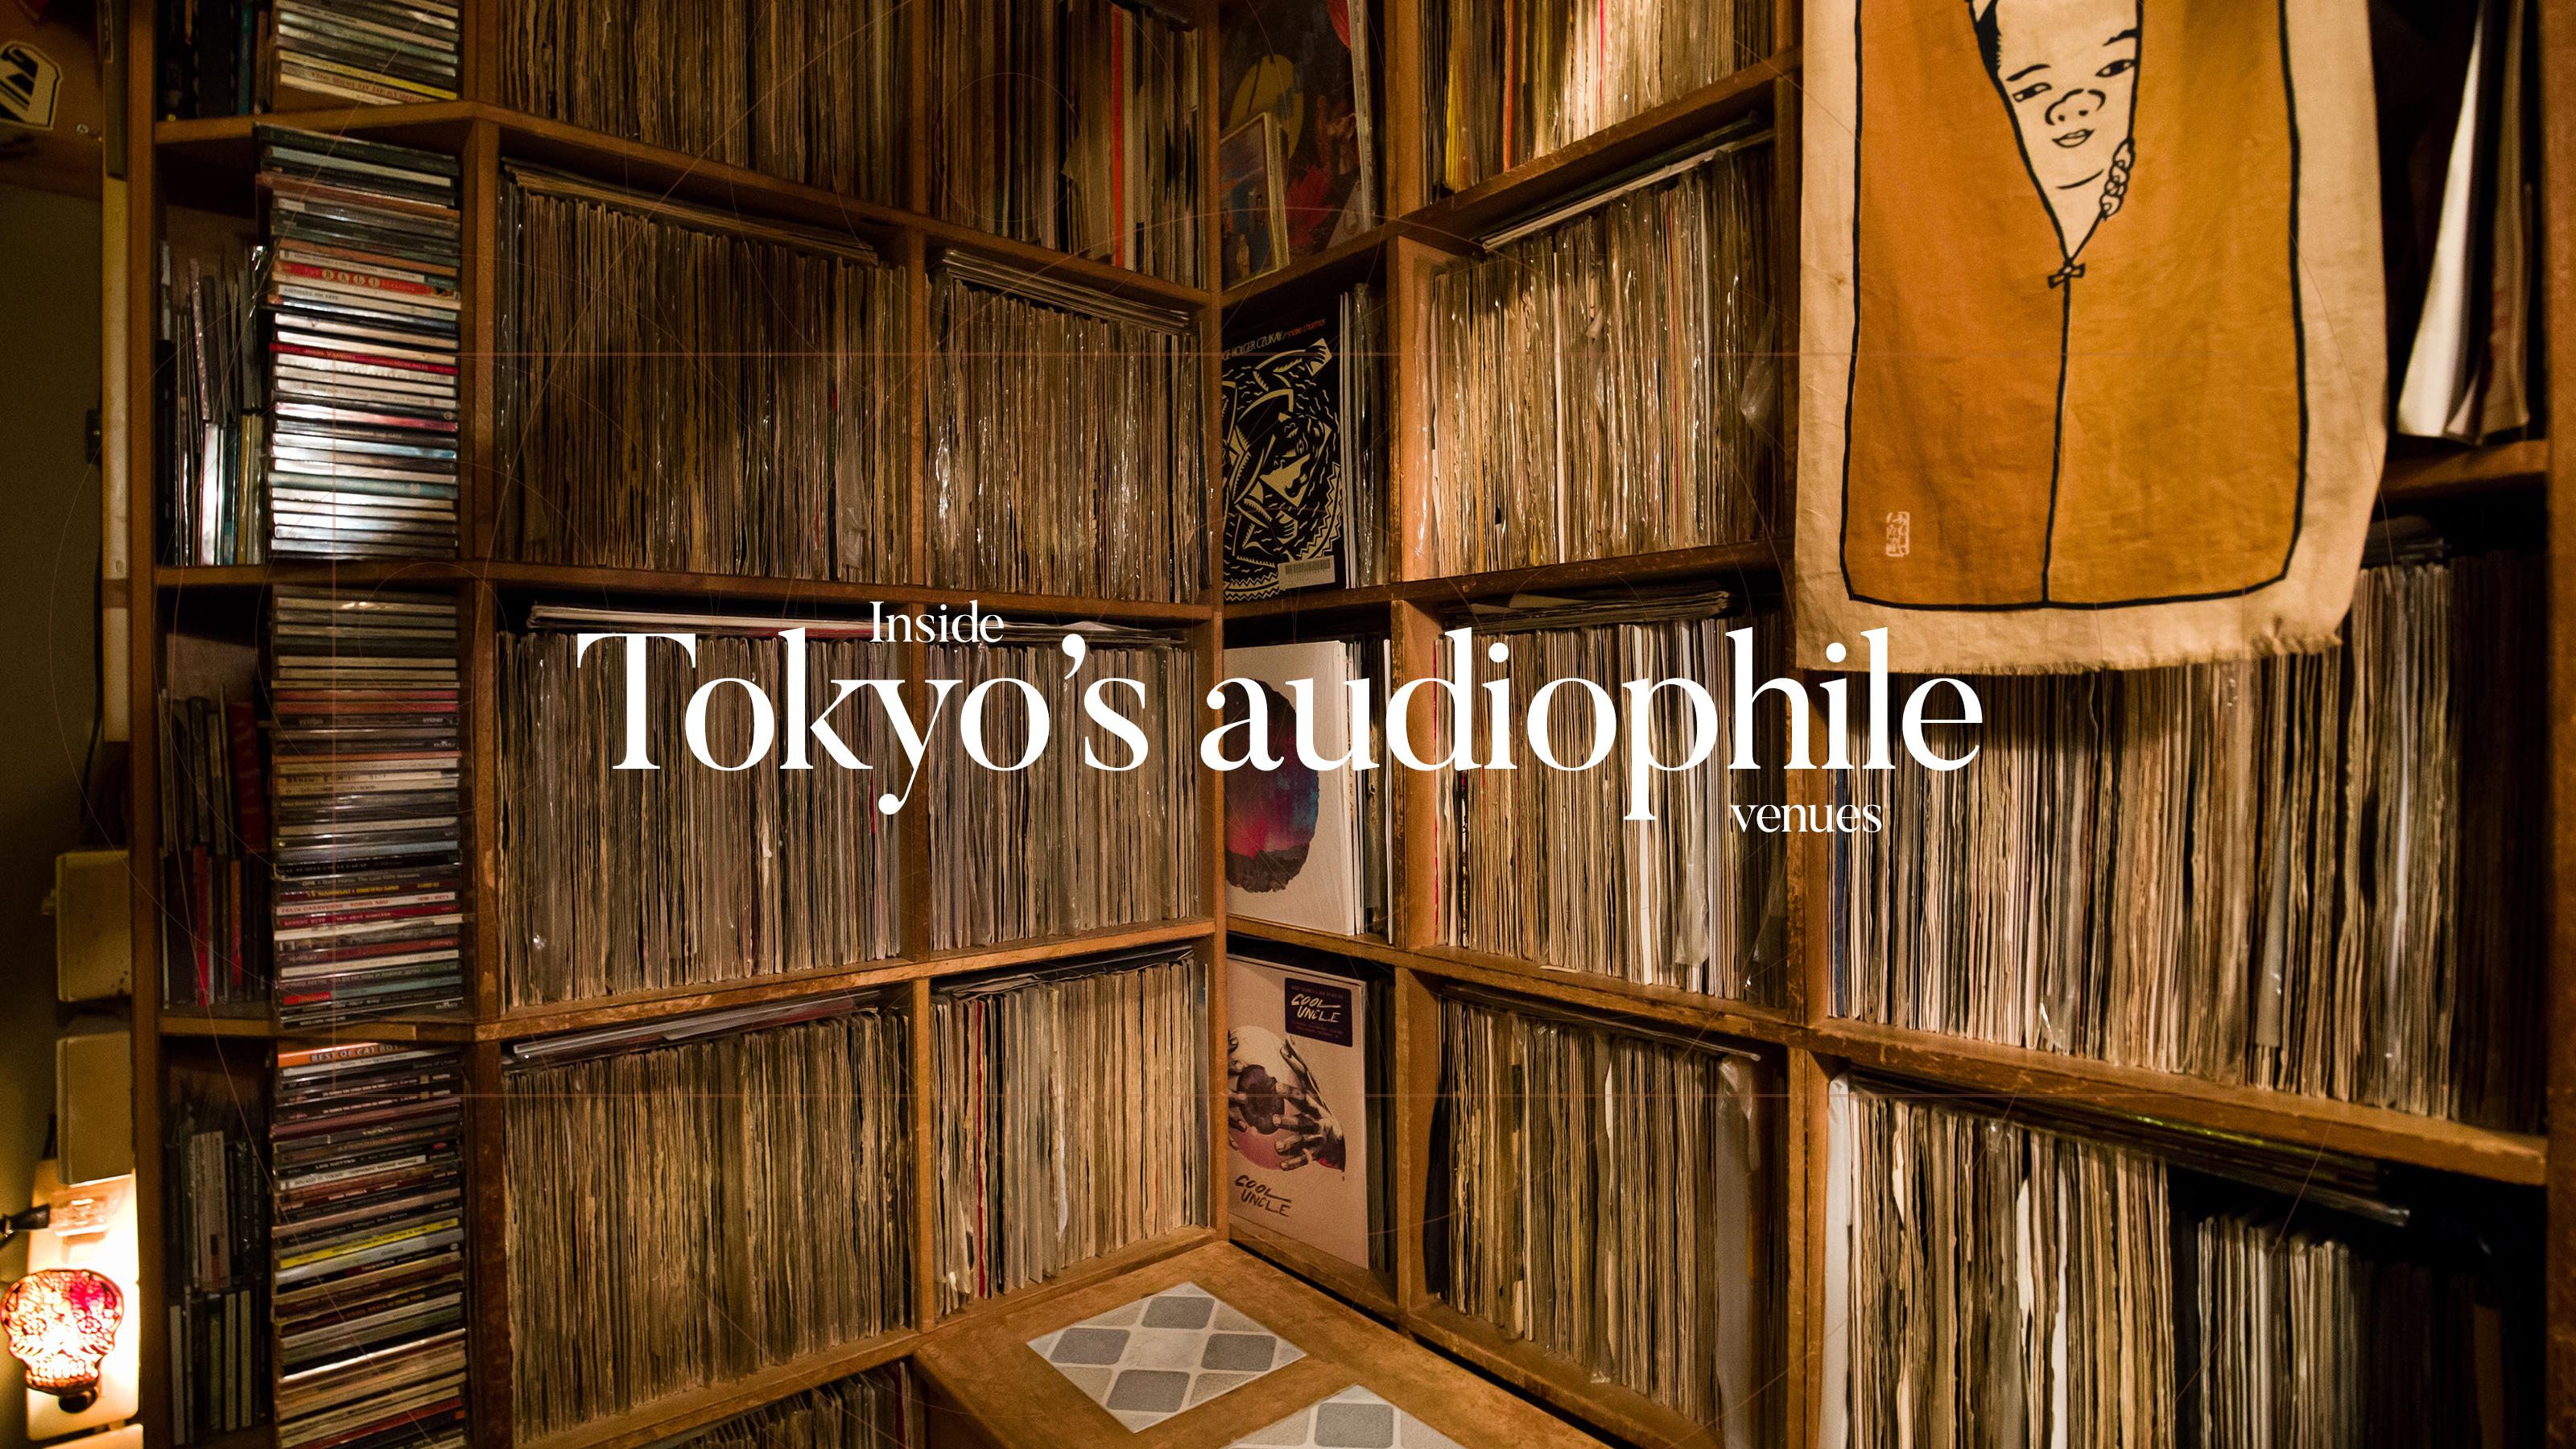 Inside Tokyo's audiophile venues